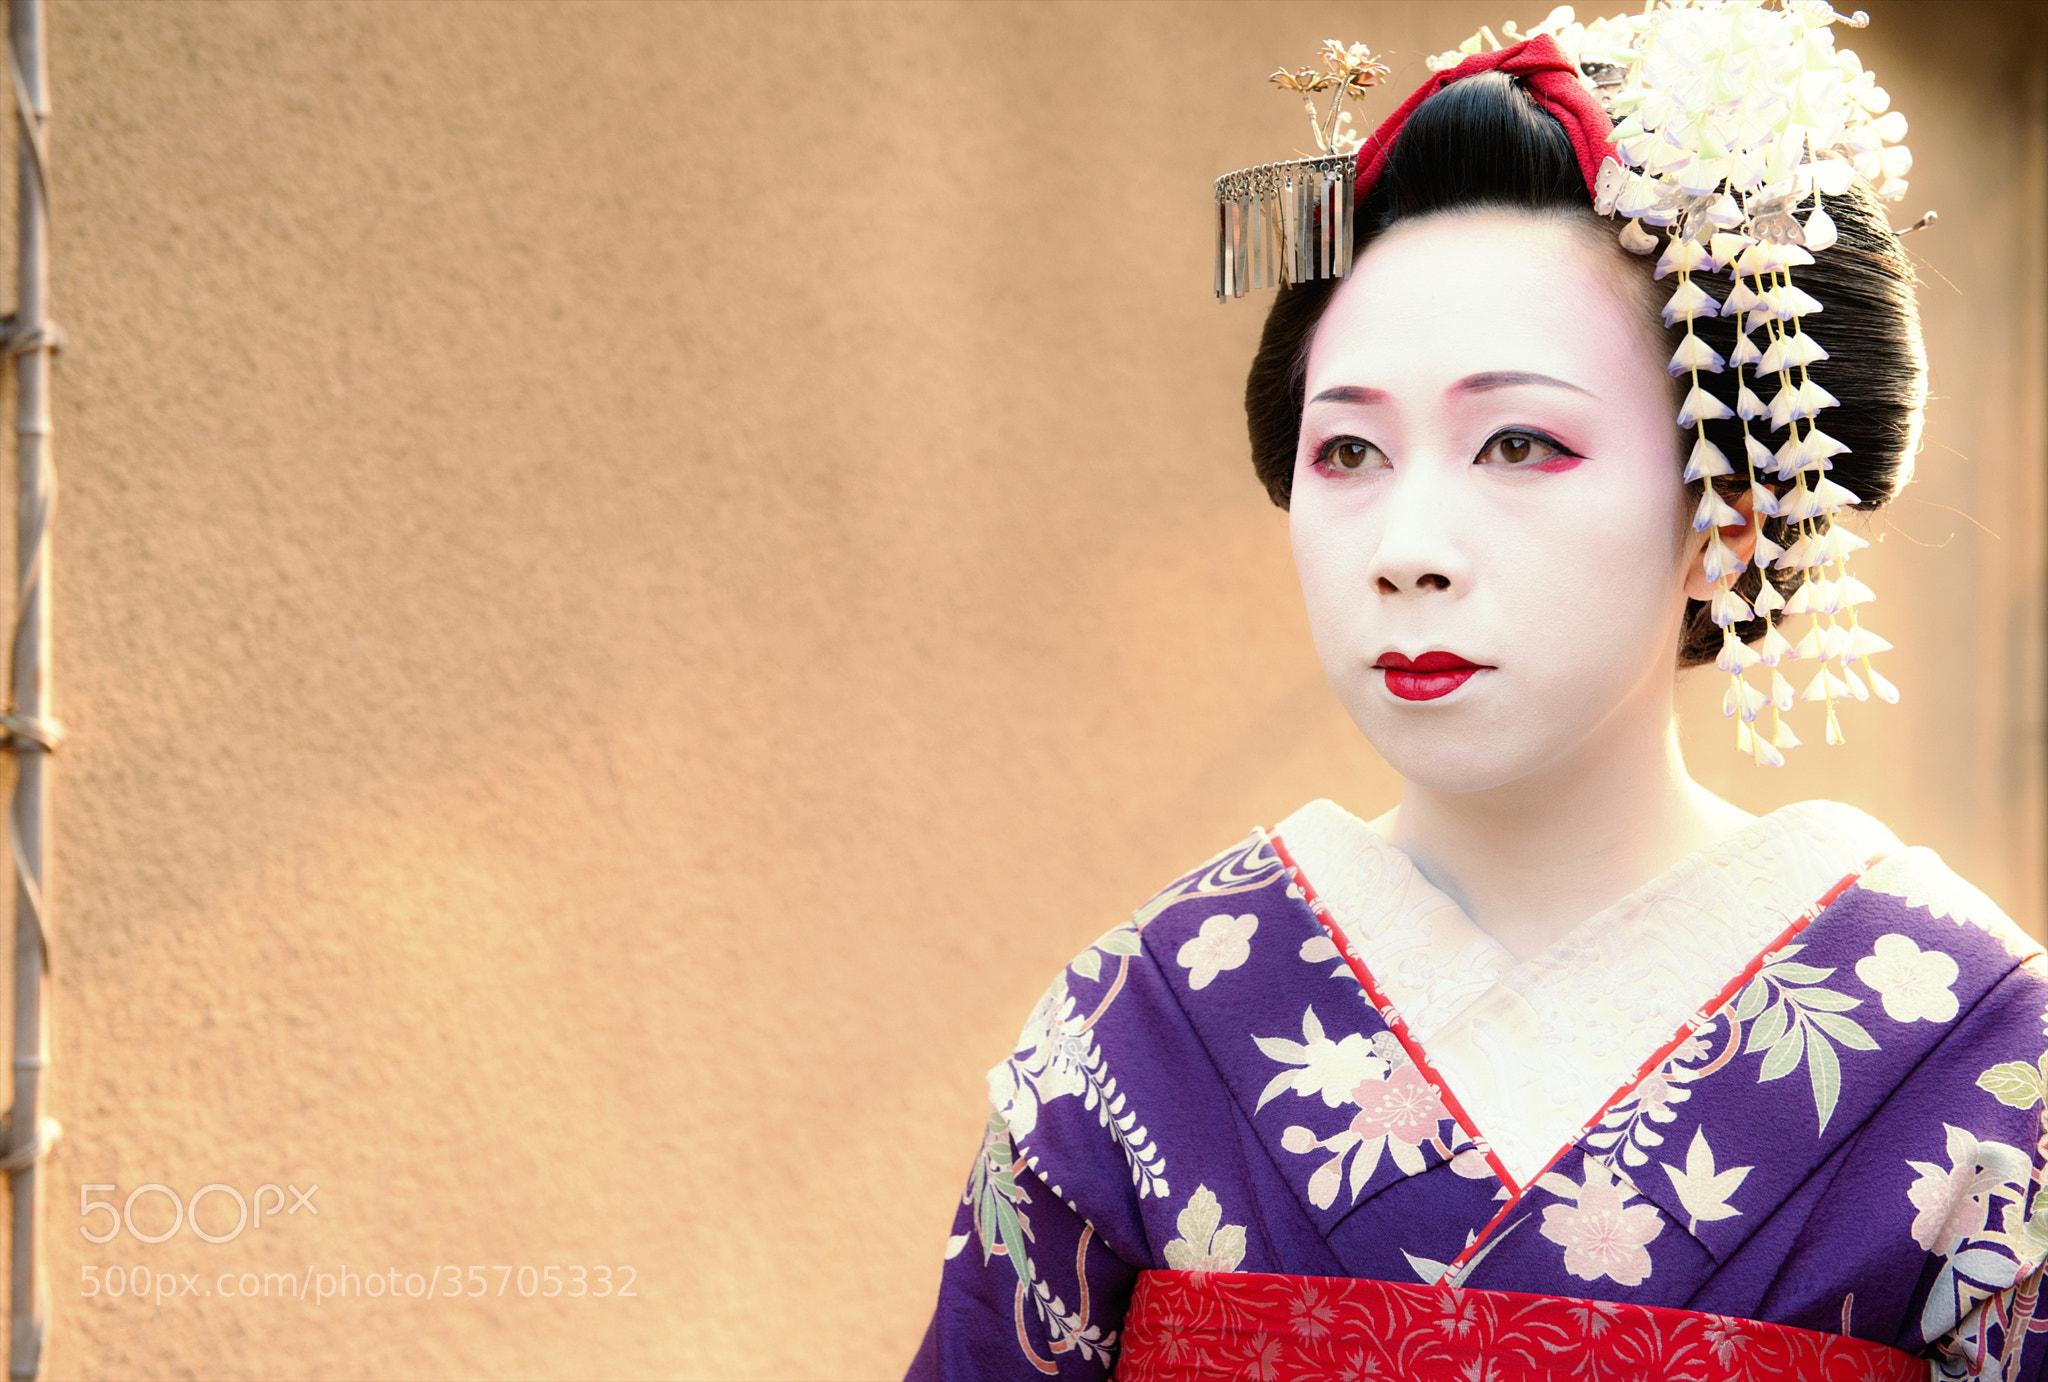 Photograph Sunset Geisha by hugh dornan on 500px